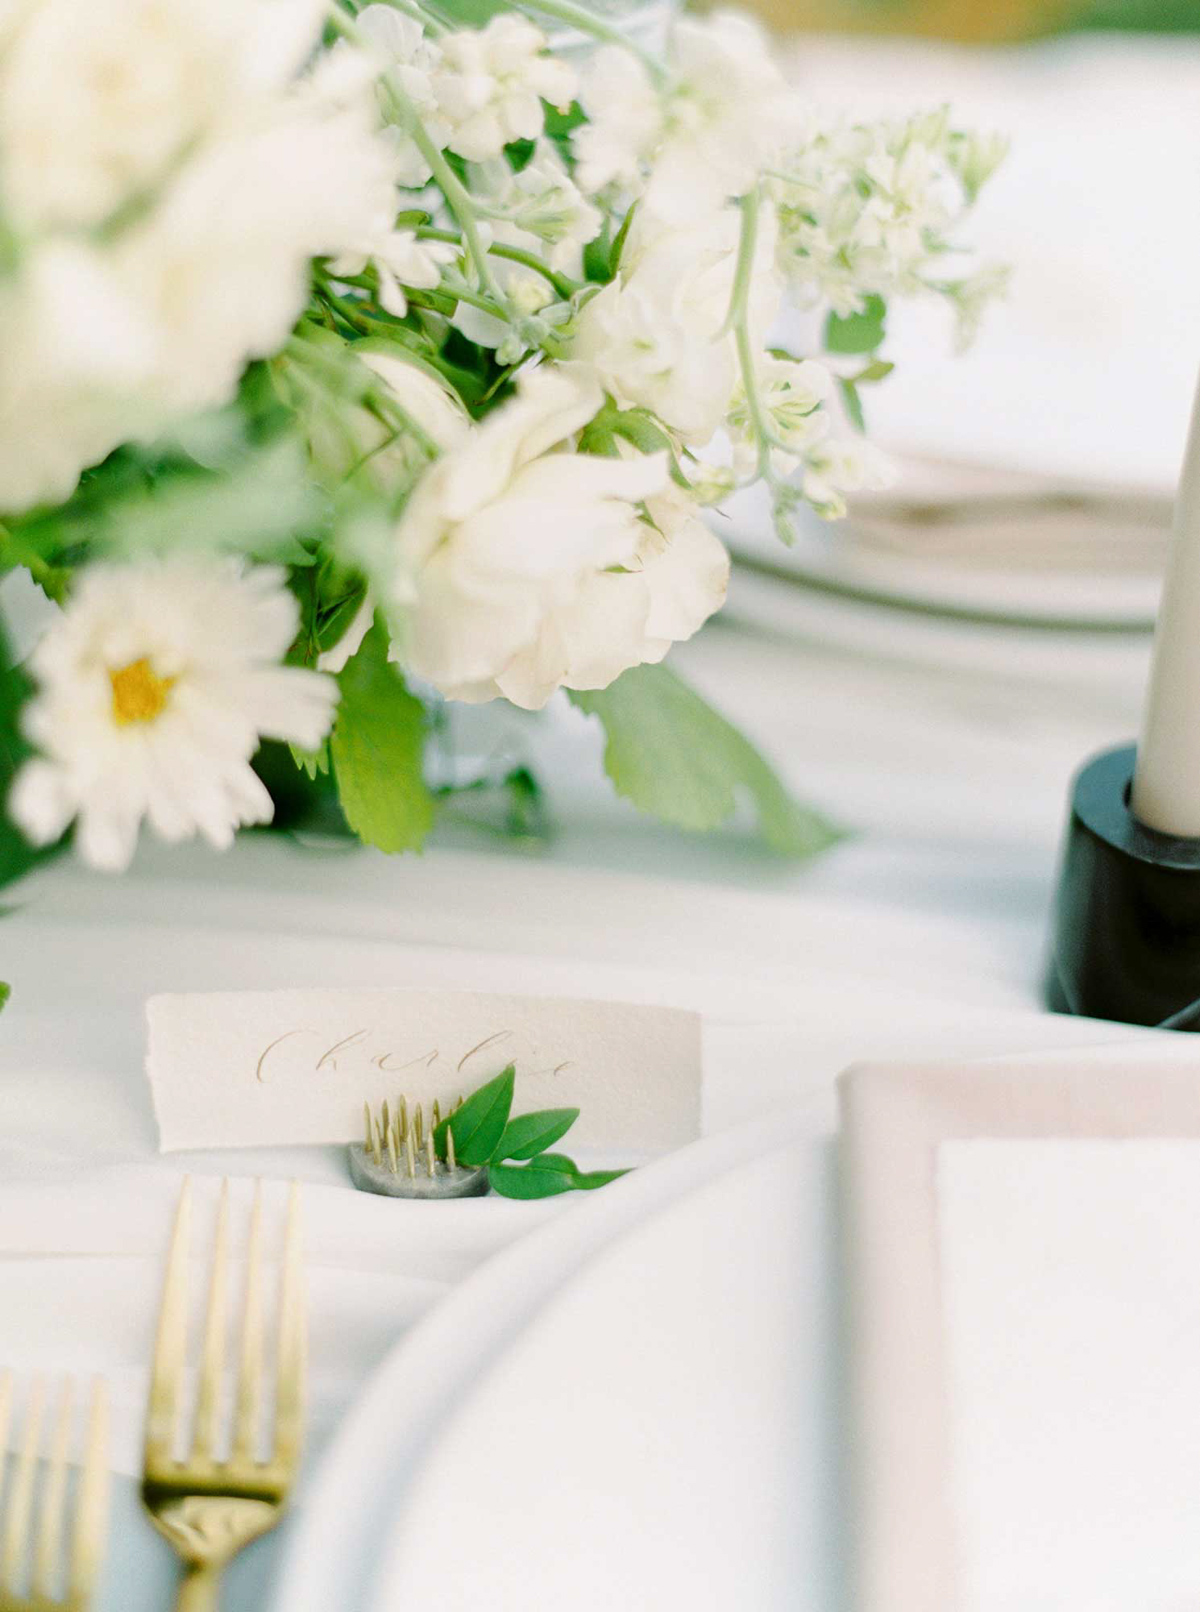 kayla-yestal-vineyard-bride-swish-list-woodland-weddings-niagara-wedding-editorial-61.jpg